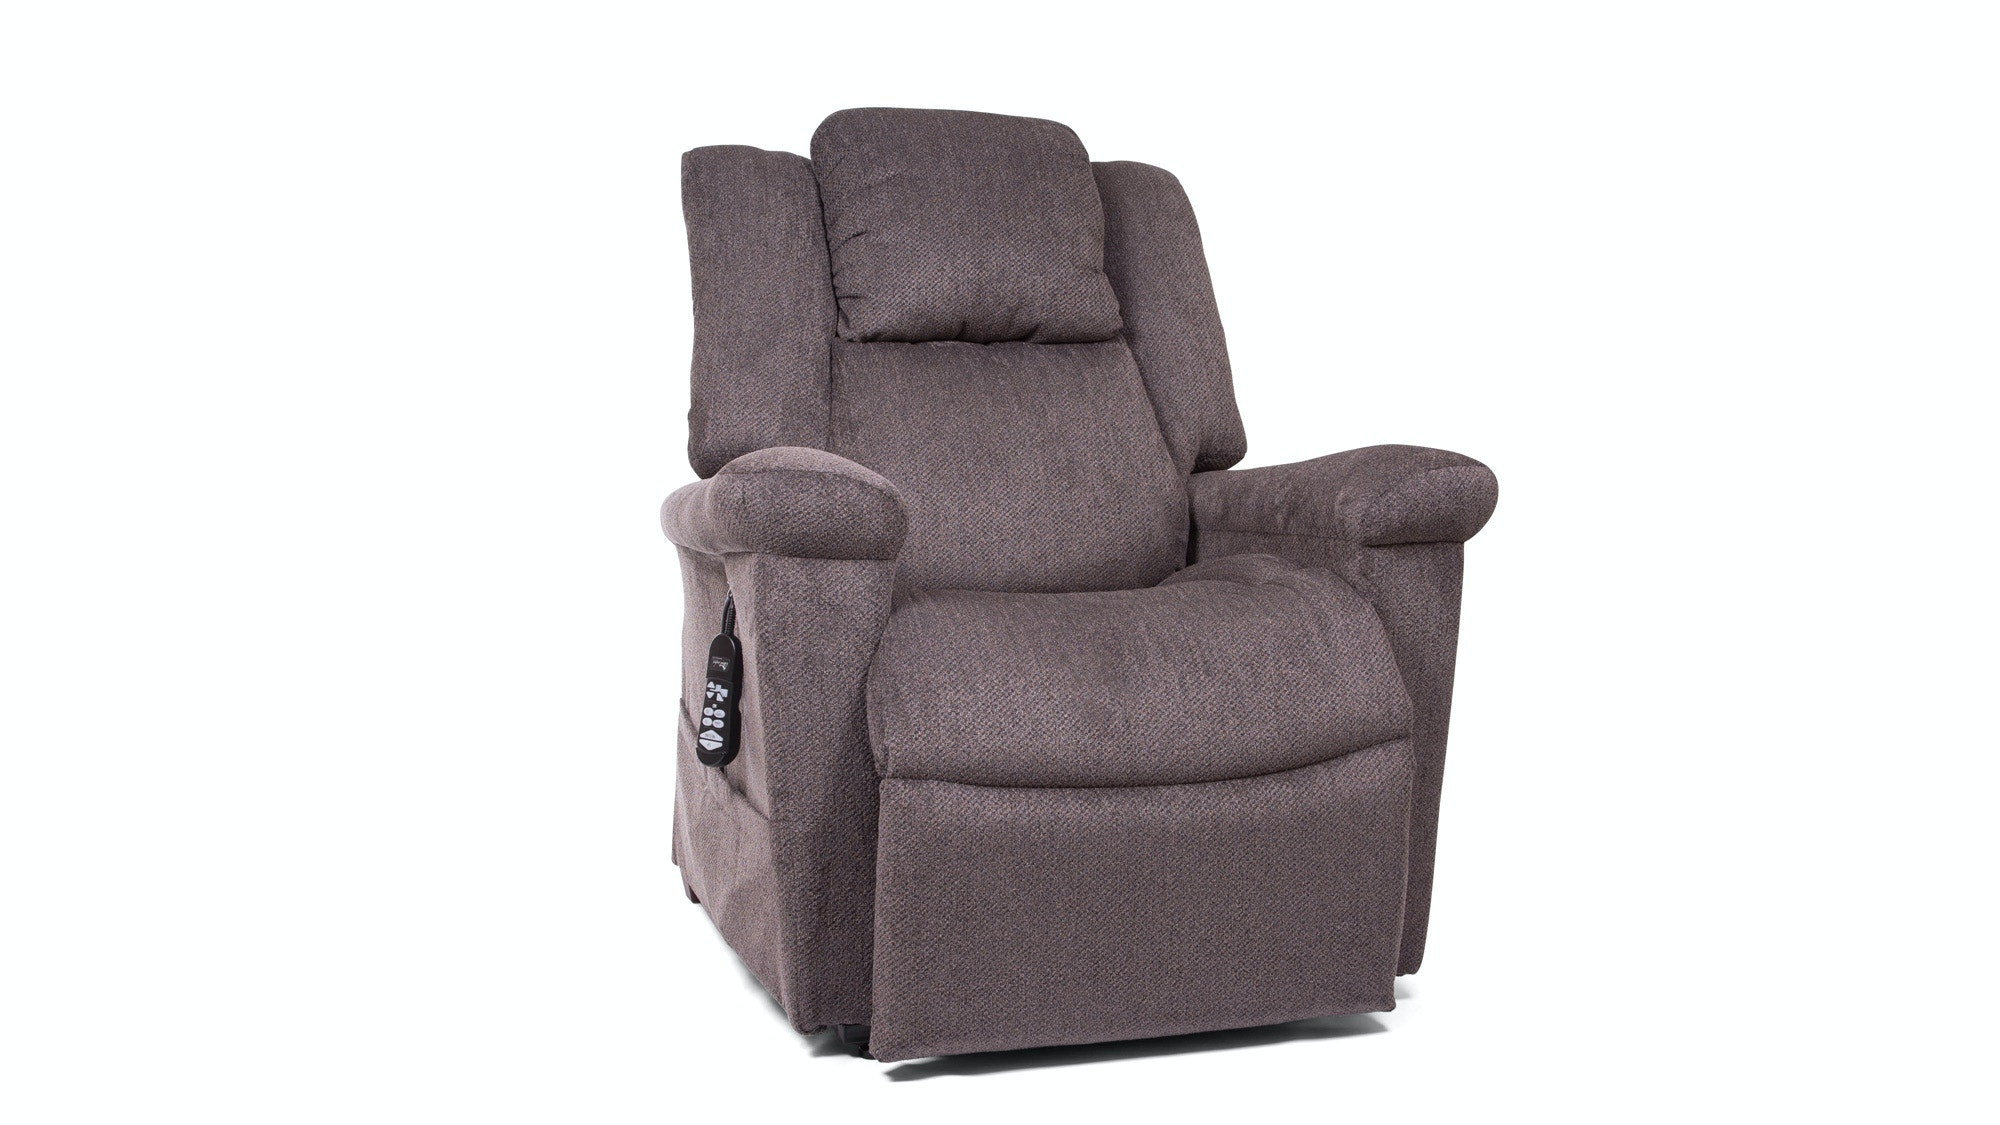 Ultra Comfort Lift Chair With Power Headrest 783060